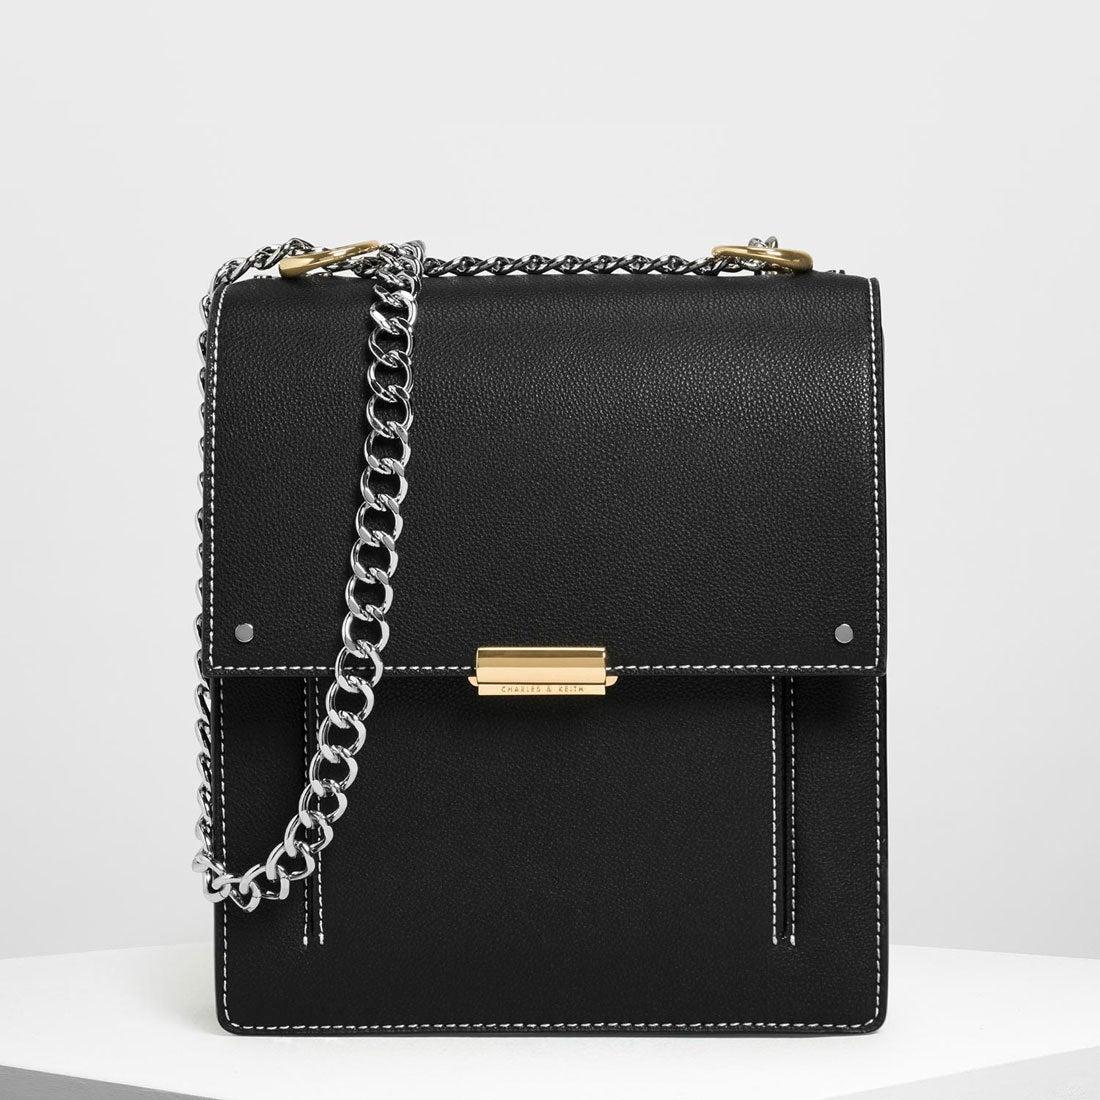 CHARLES \u0026 KEITH チェーンストラップ ポートレートメッセンジャーバッグ / Chain Strap Portrait Messenger  Bag (Black ,靴&ファッション通販 ロコンド〜自宅で